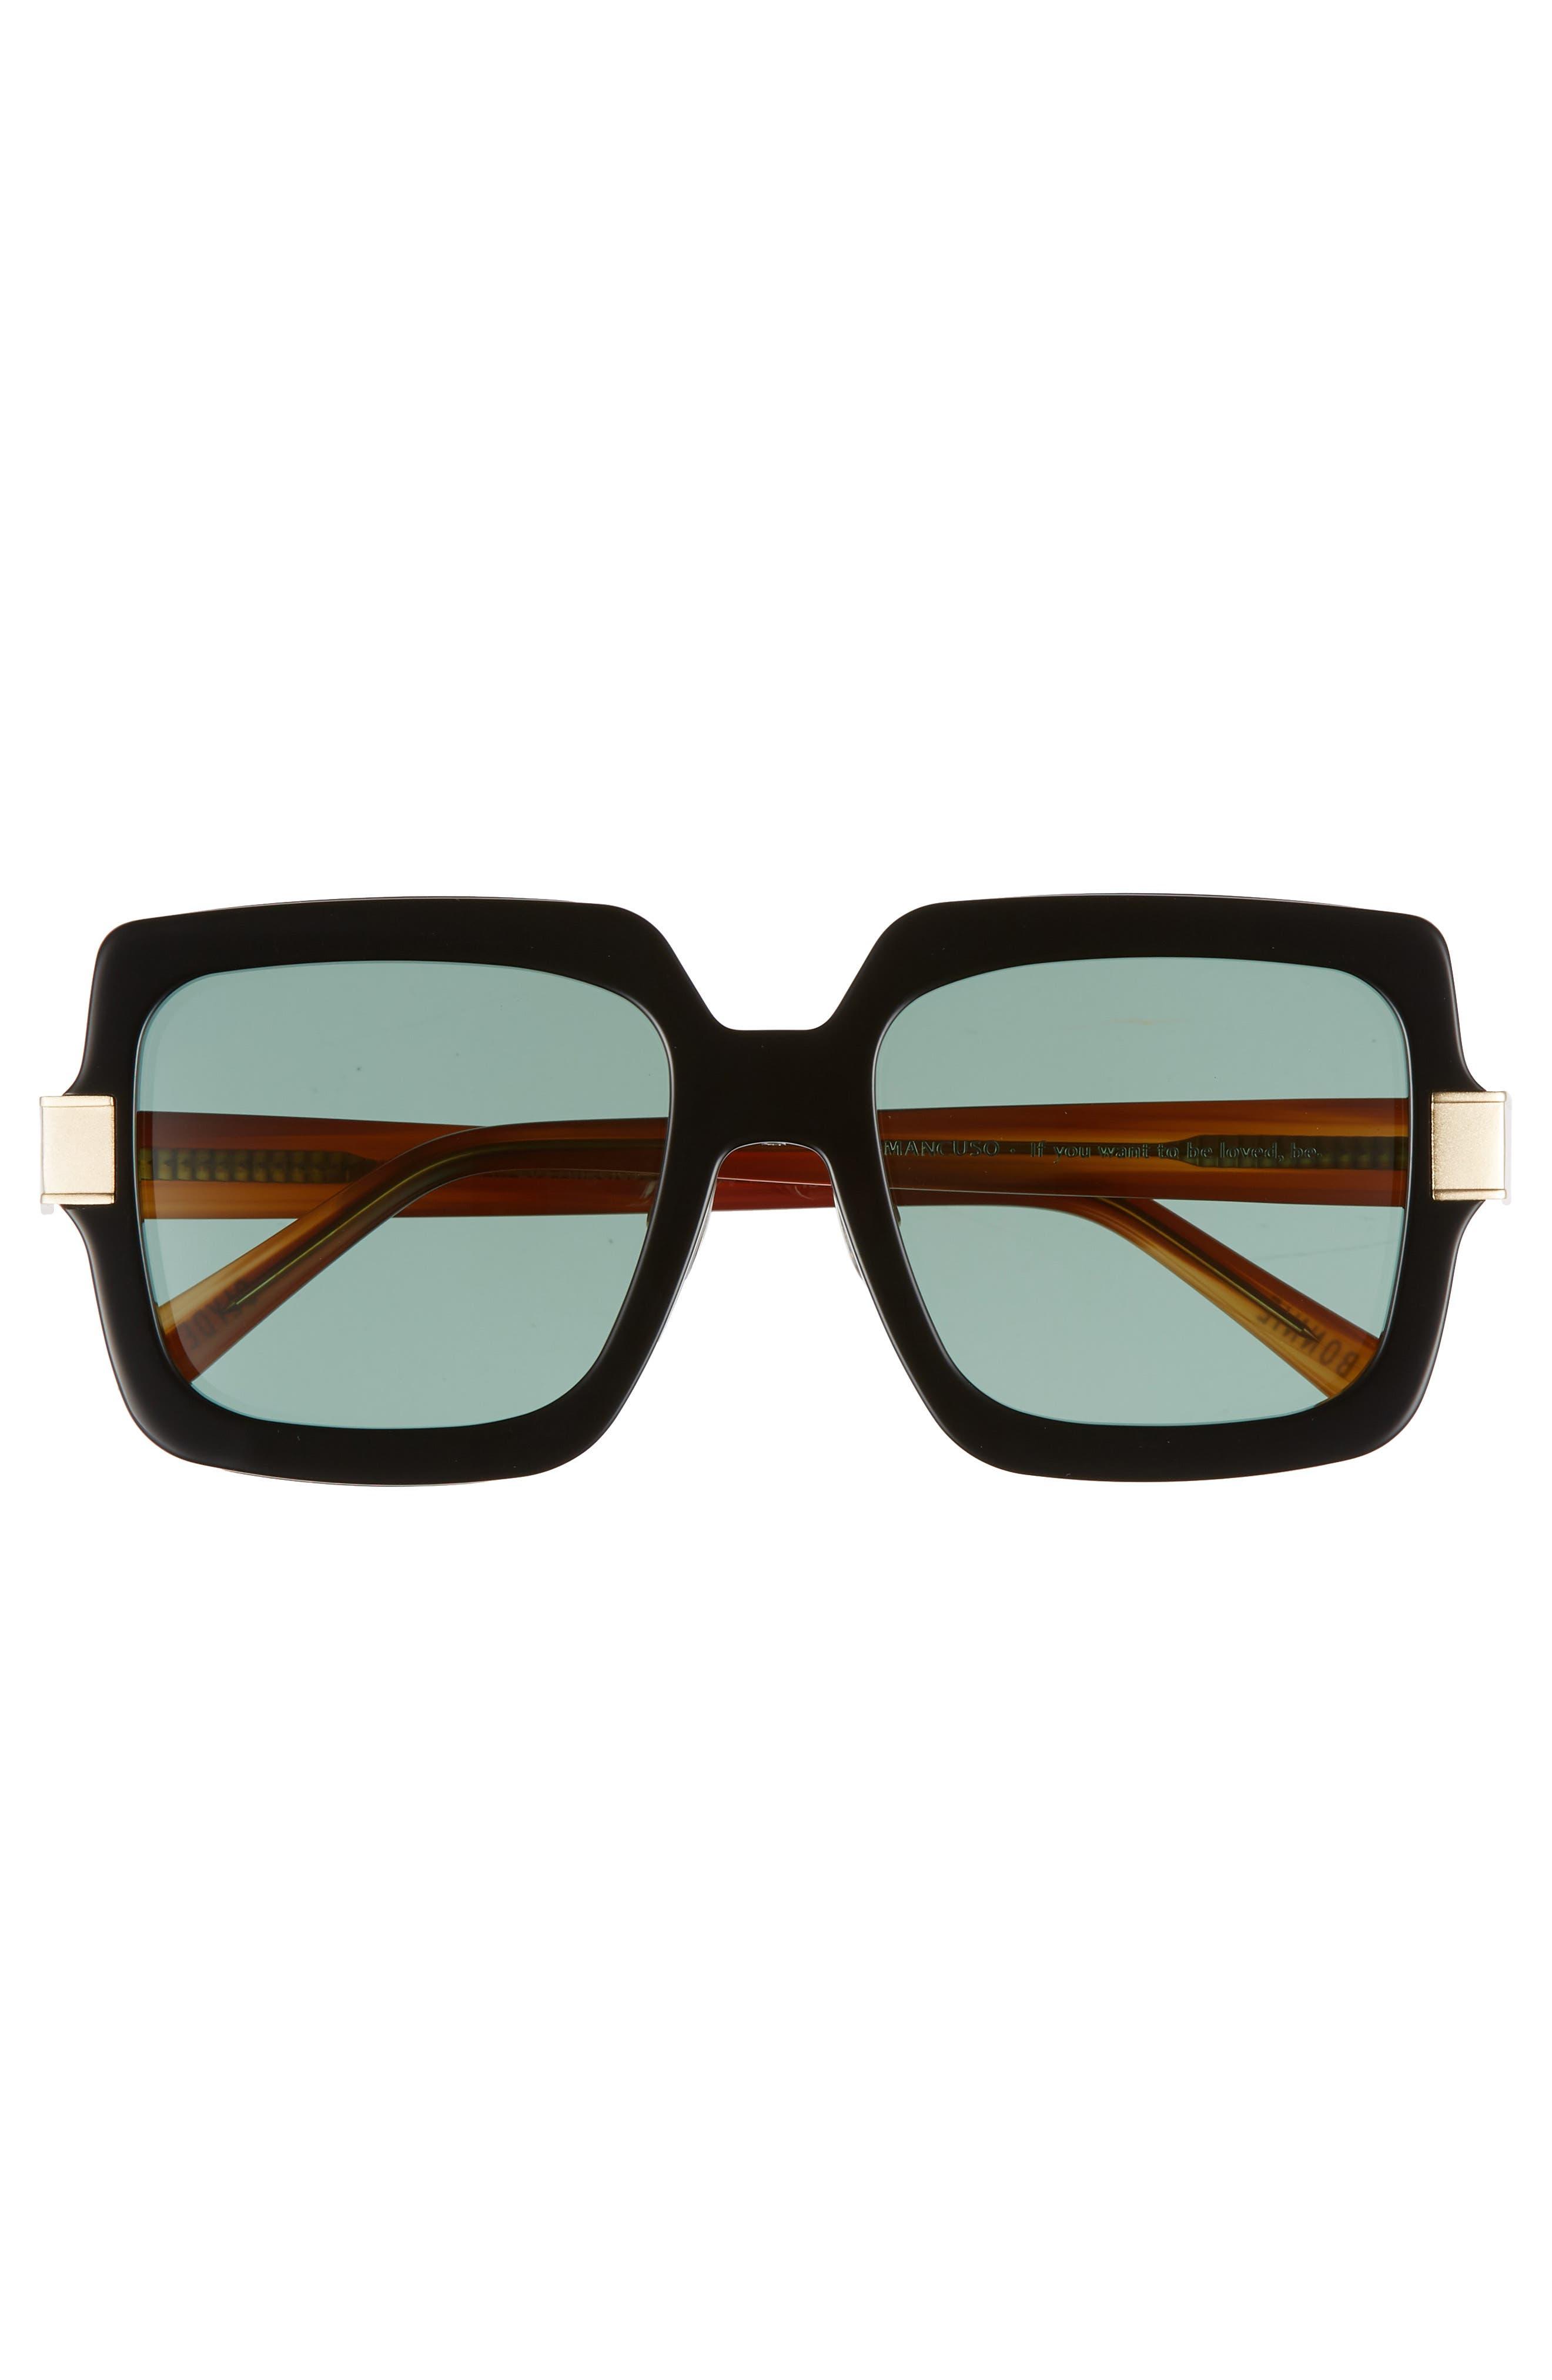 Mancuso 54mm Sunglasses,                             Alternate thumbnail 3, color,                             001